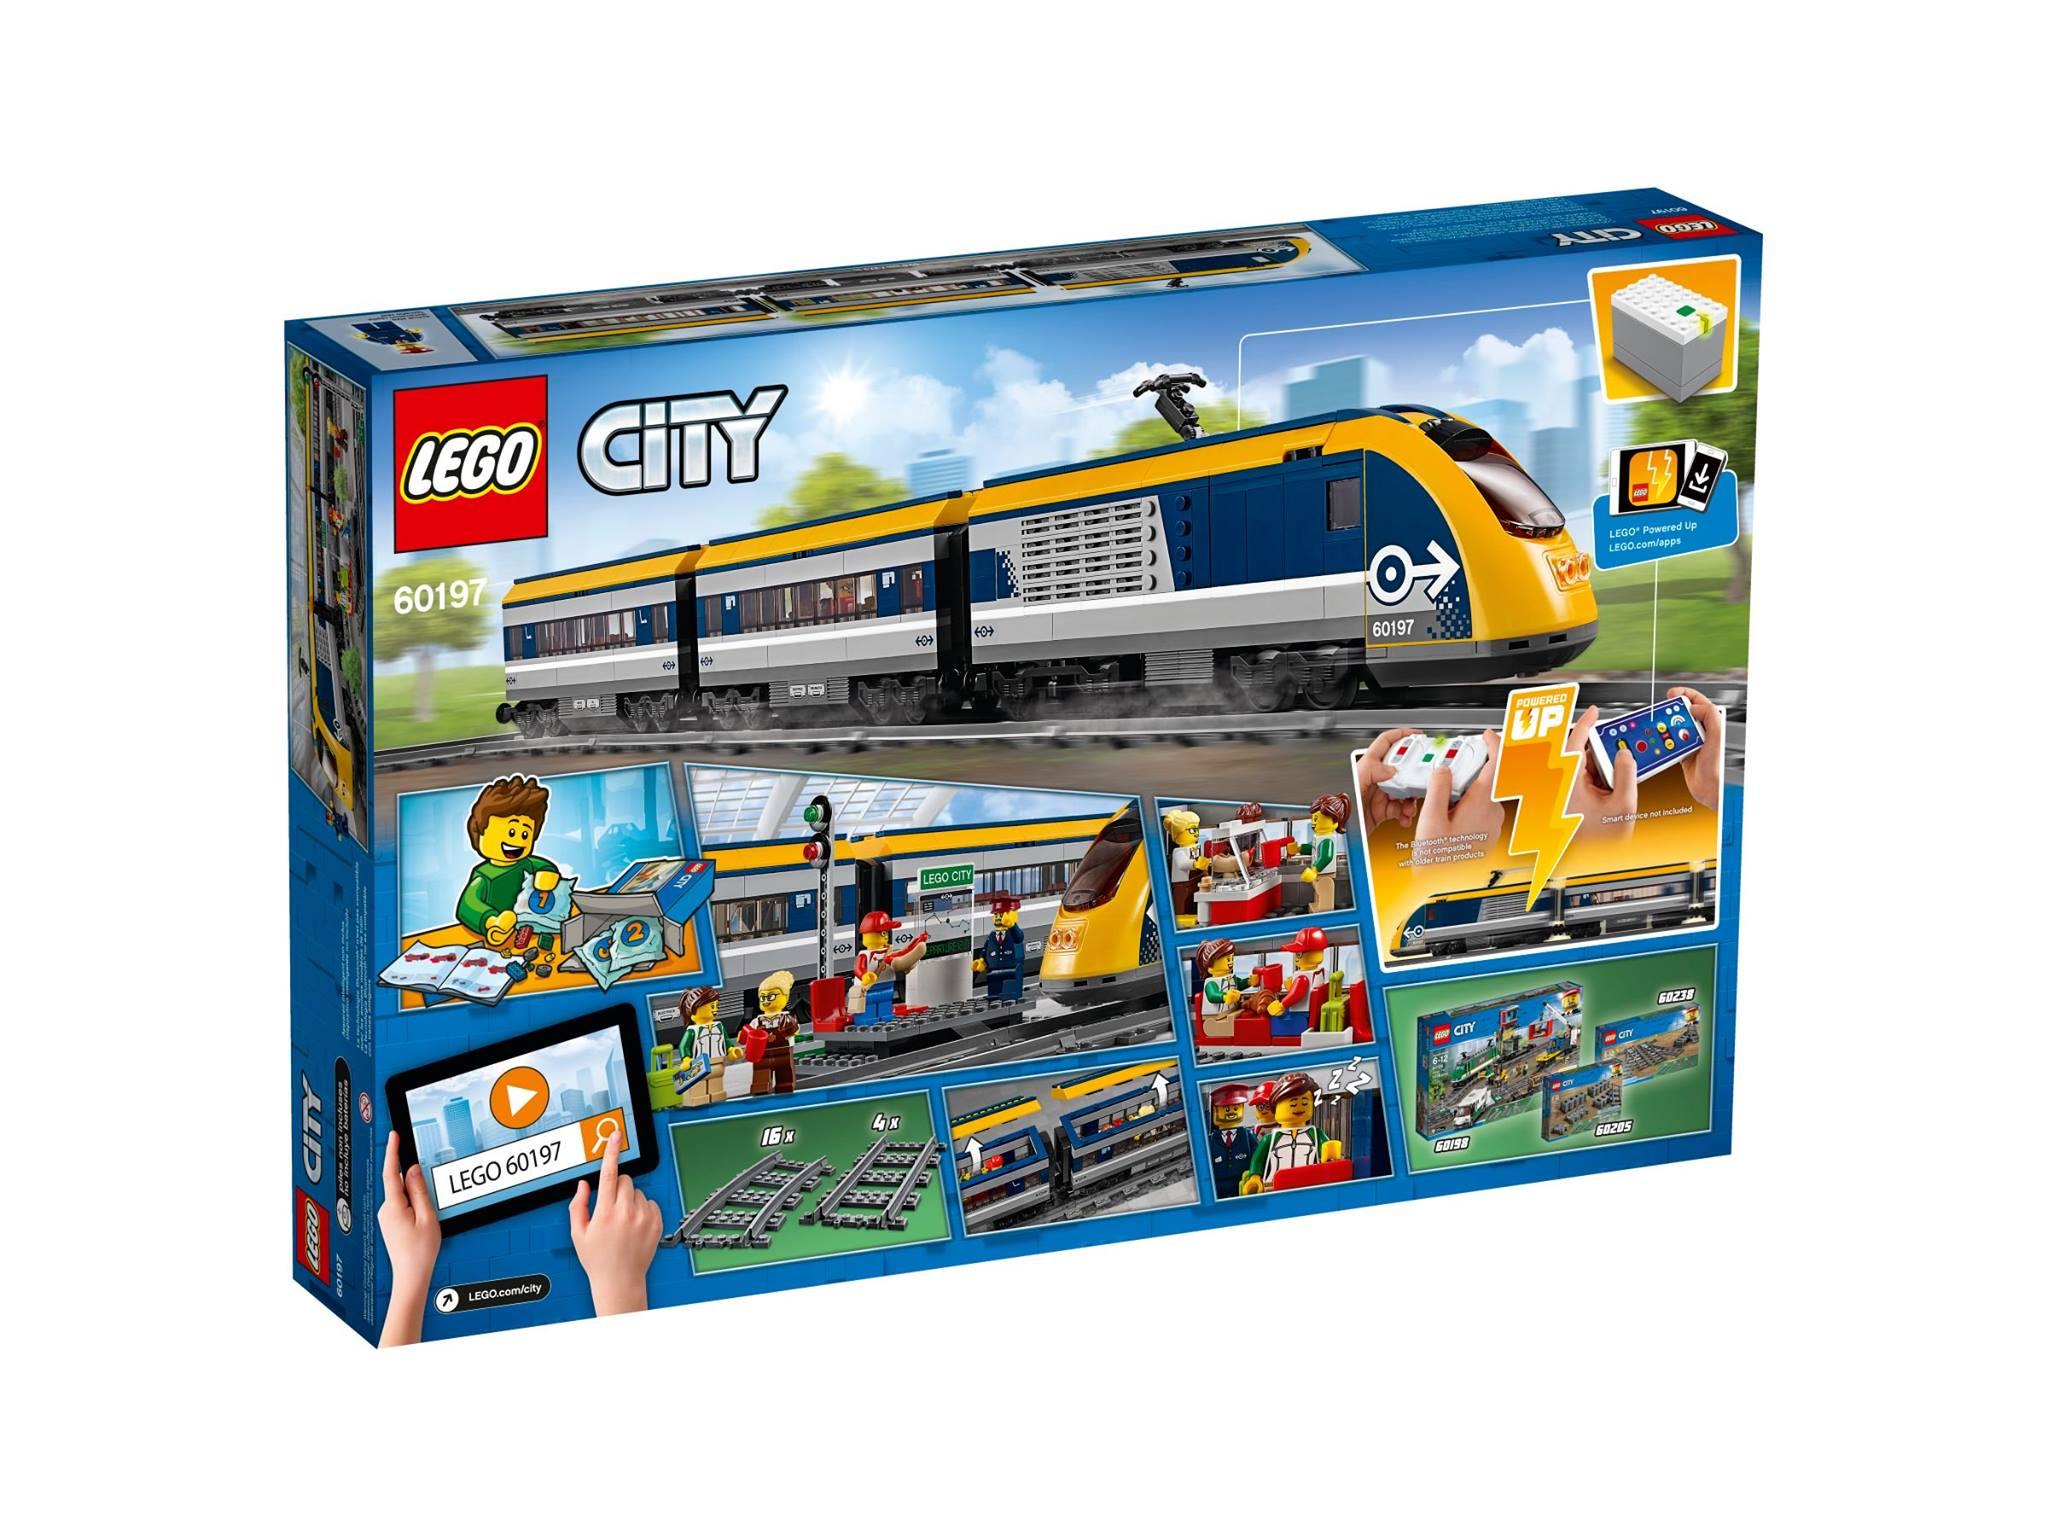 LEGO City Passenger Train 2018 (set 60197) box back